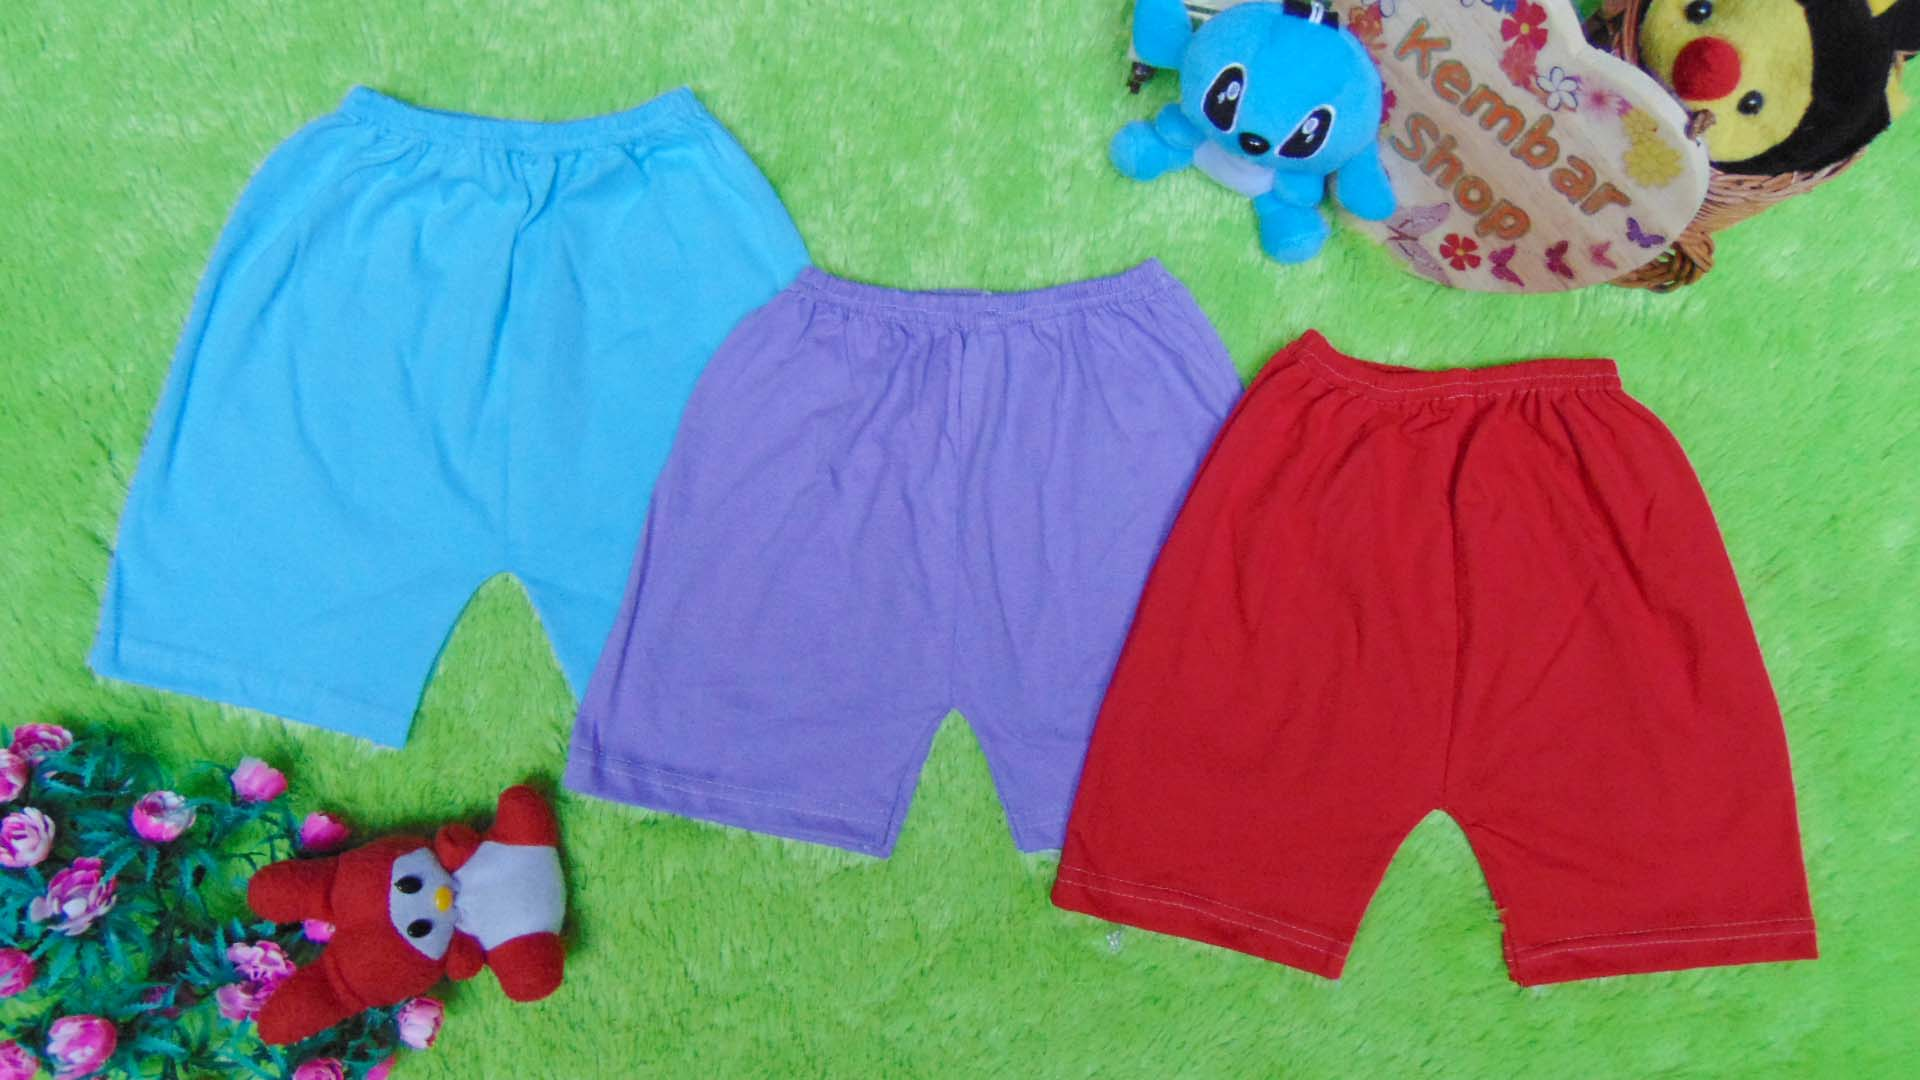 paket hemat set 3pcs celana pendek anak bayi batita all size 1-3th RAINBOW warna random (3)